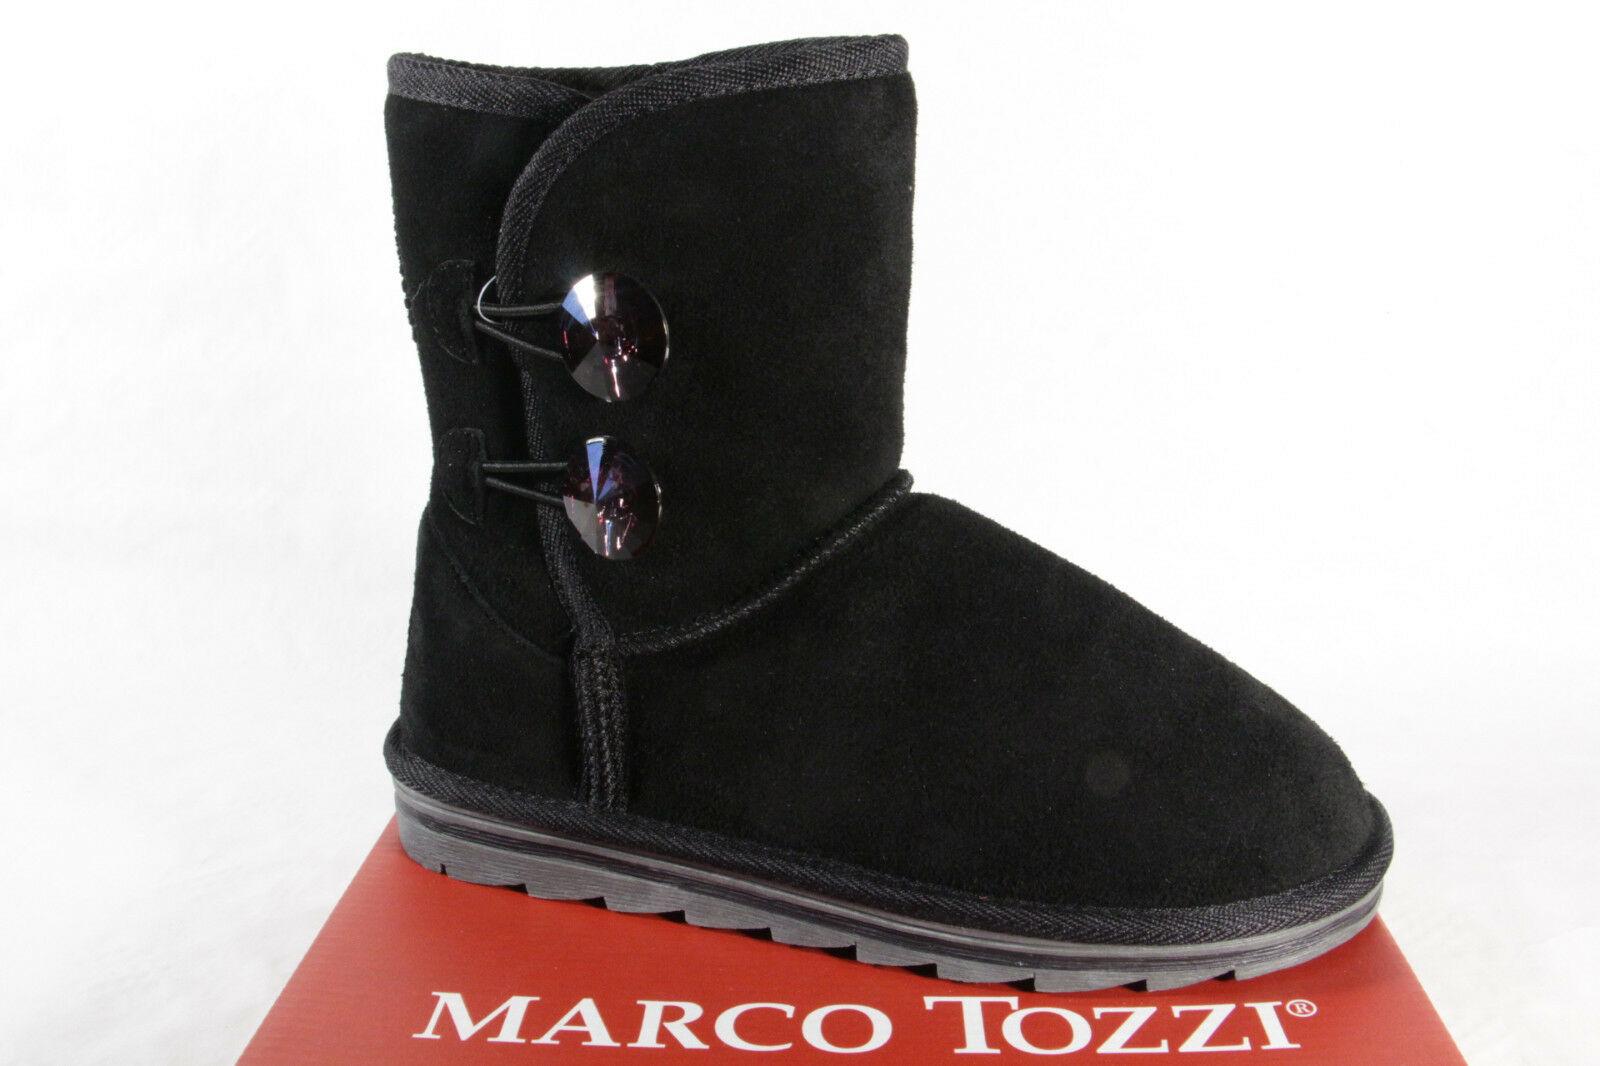 Marco Tozzi 26484 Damen Stiefel, Stiefelette, Stiefel Echtleder schwarz NEU